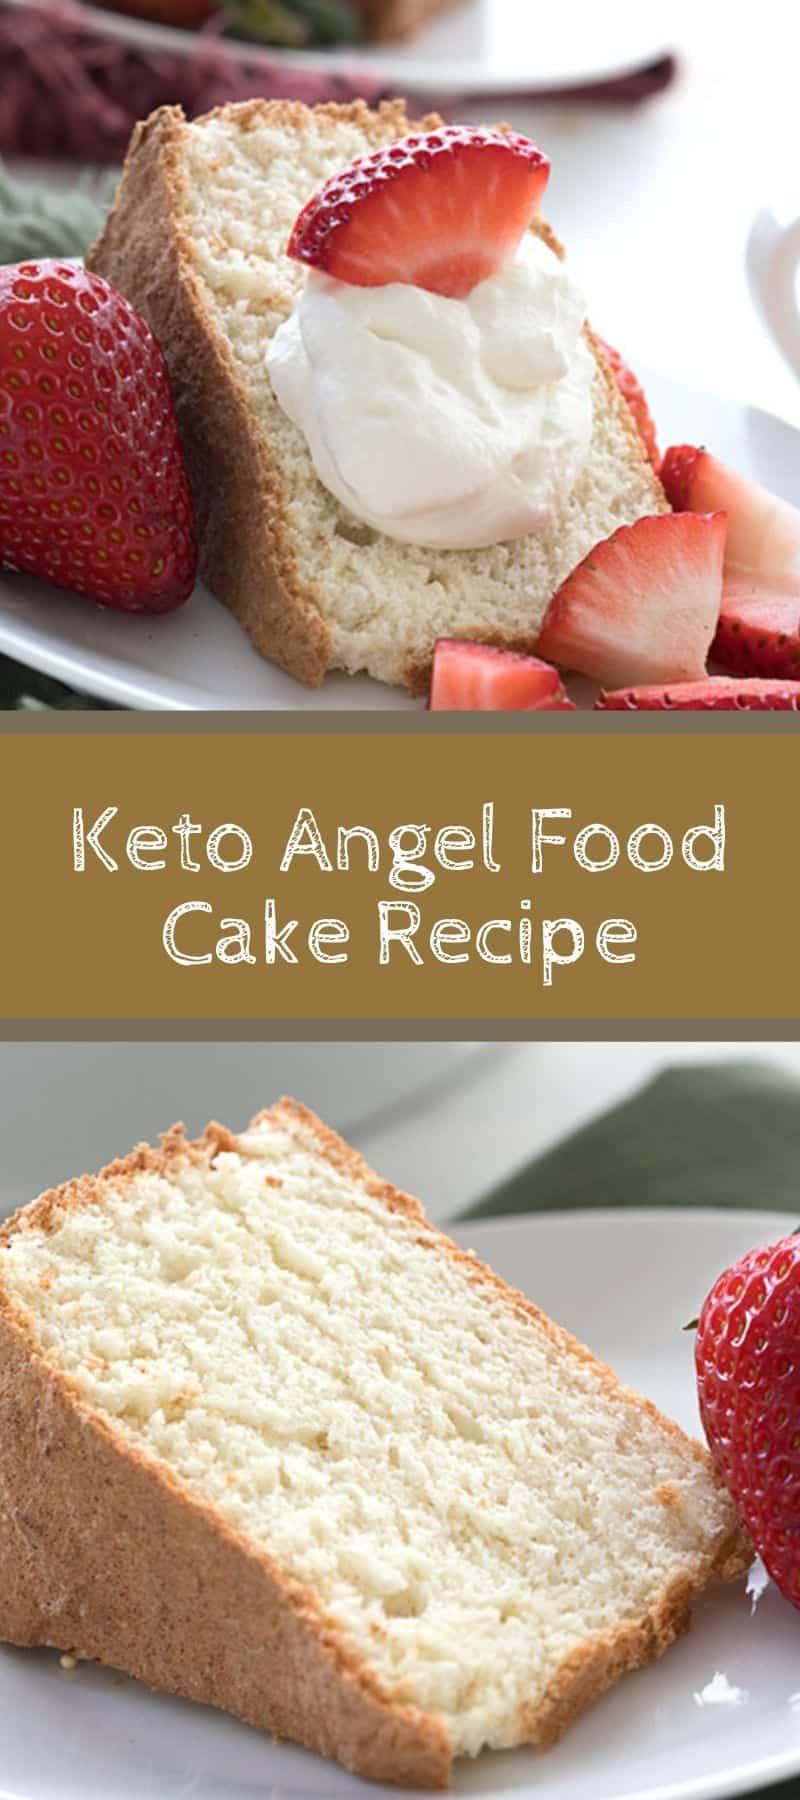 Keto Angel Food Cake Recipe 3